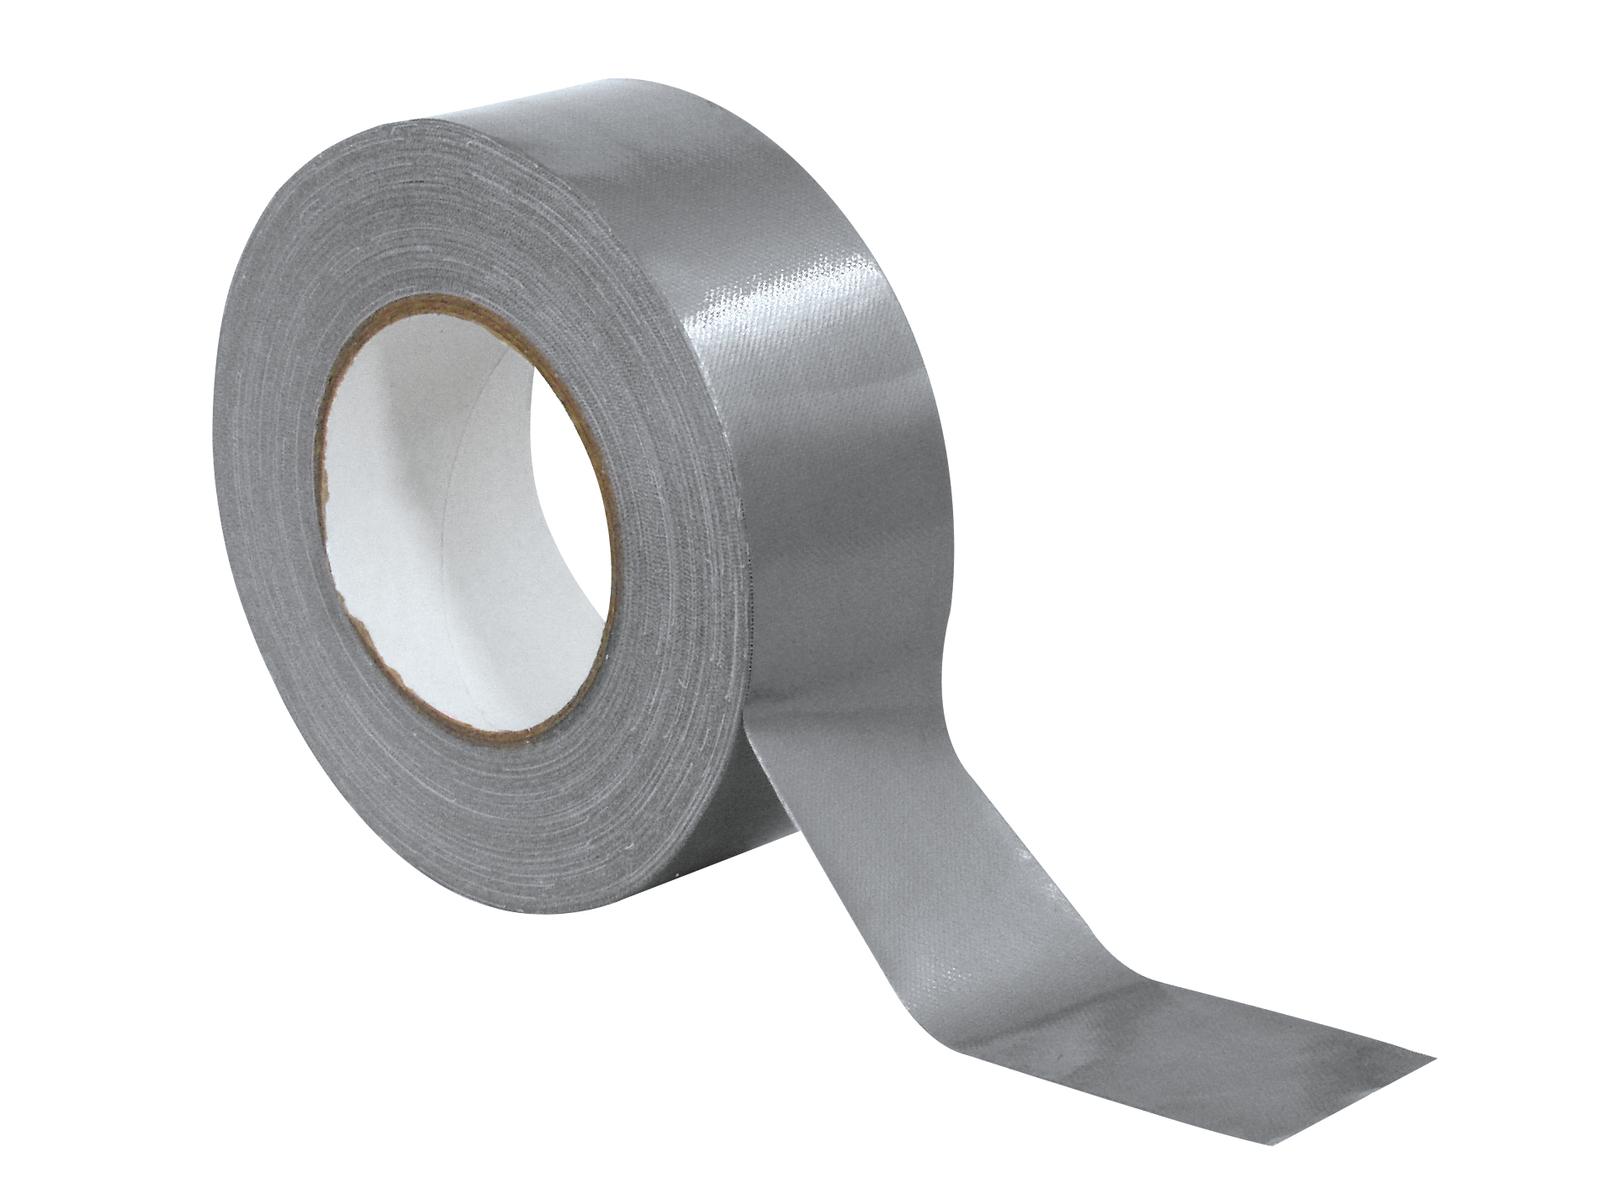 ACCESSORY Gaffa Tape Pro 50mm x 50m silber